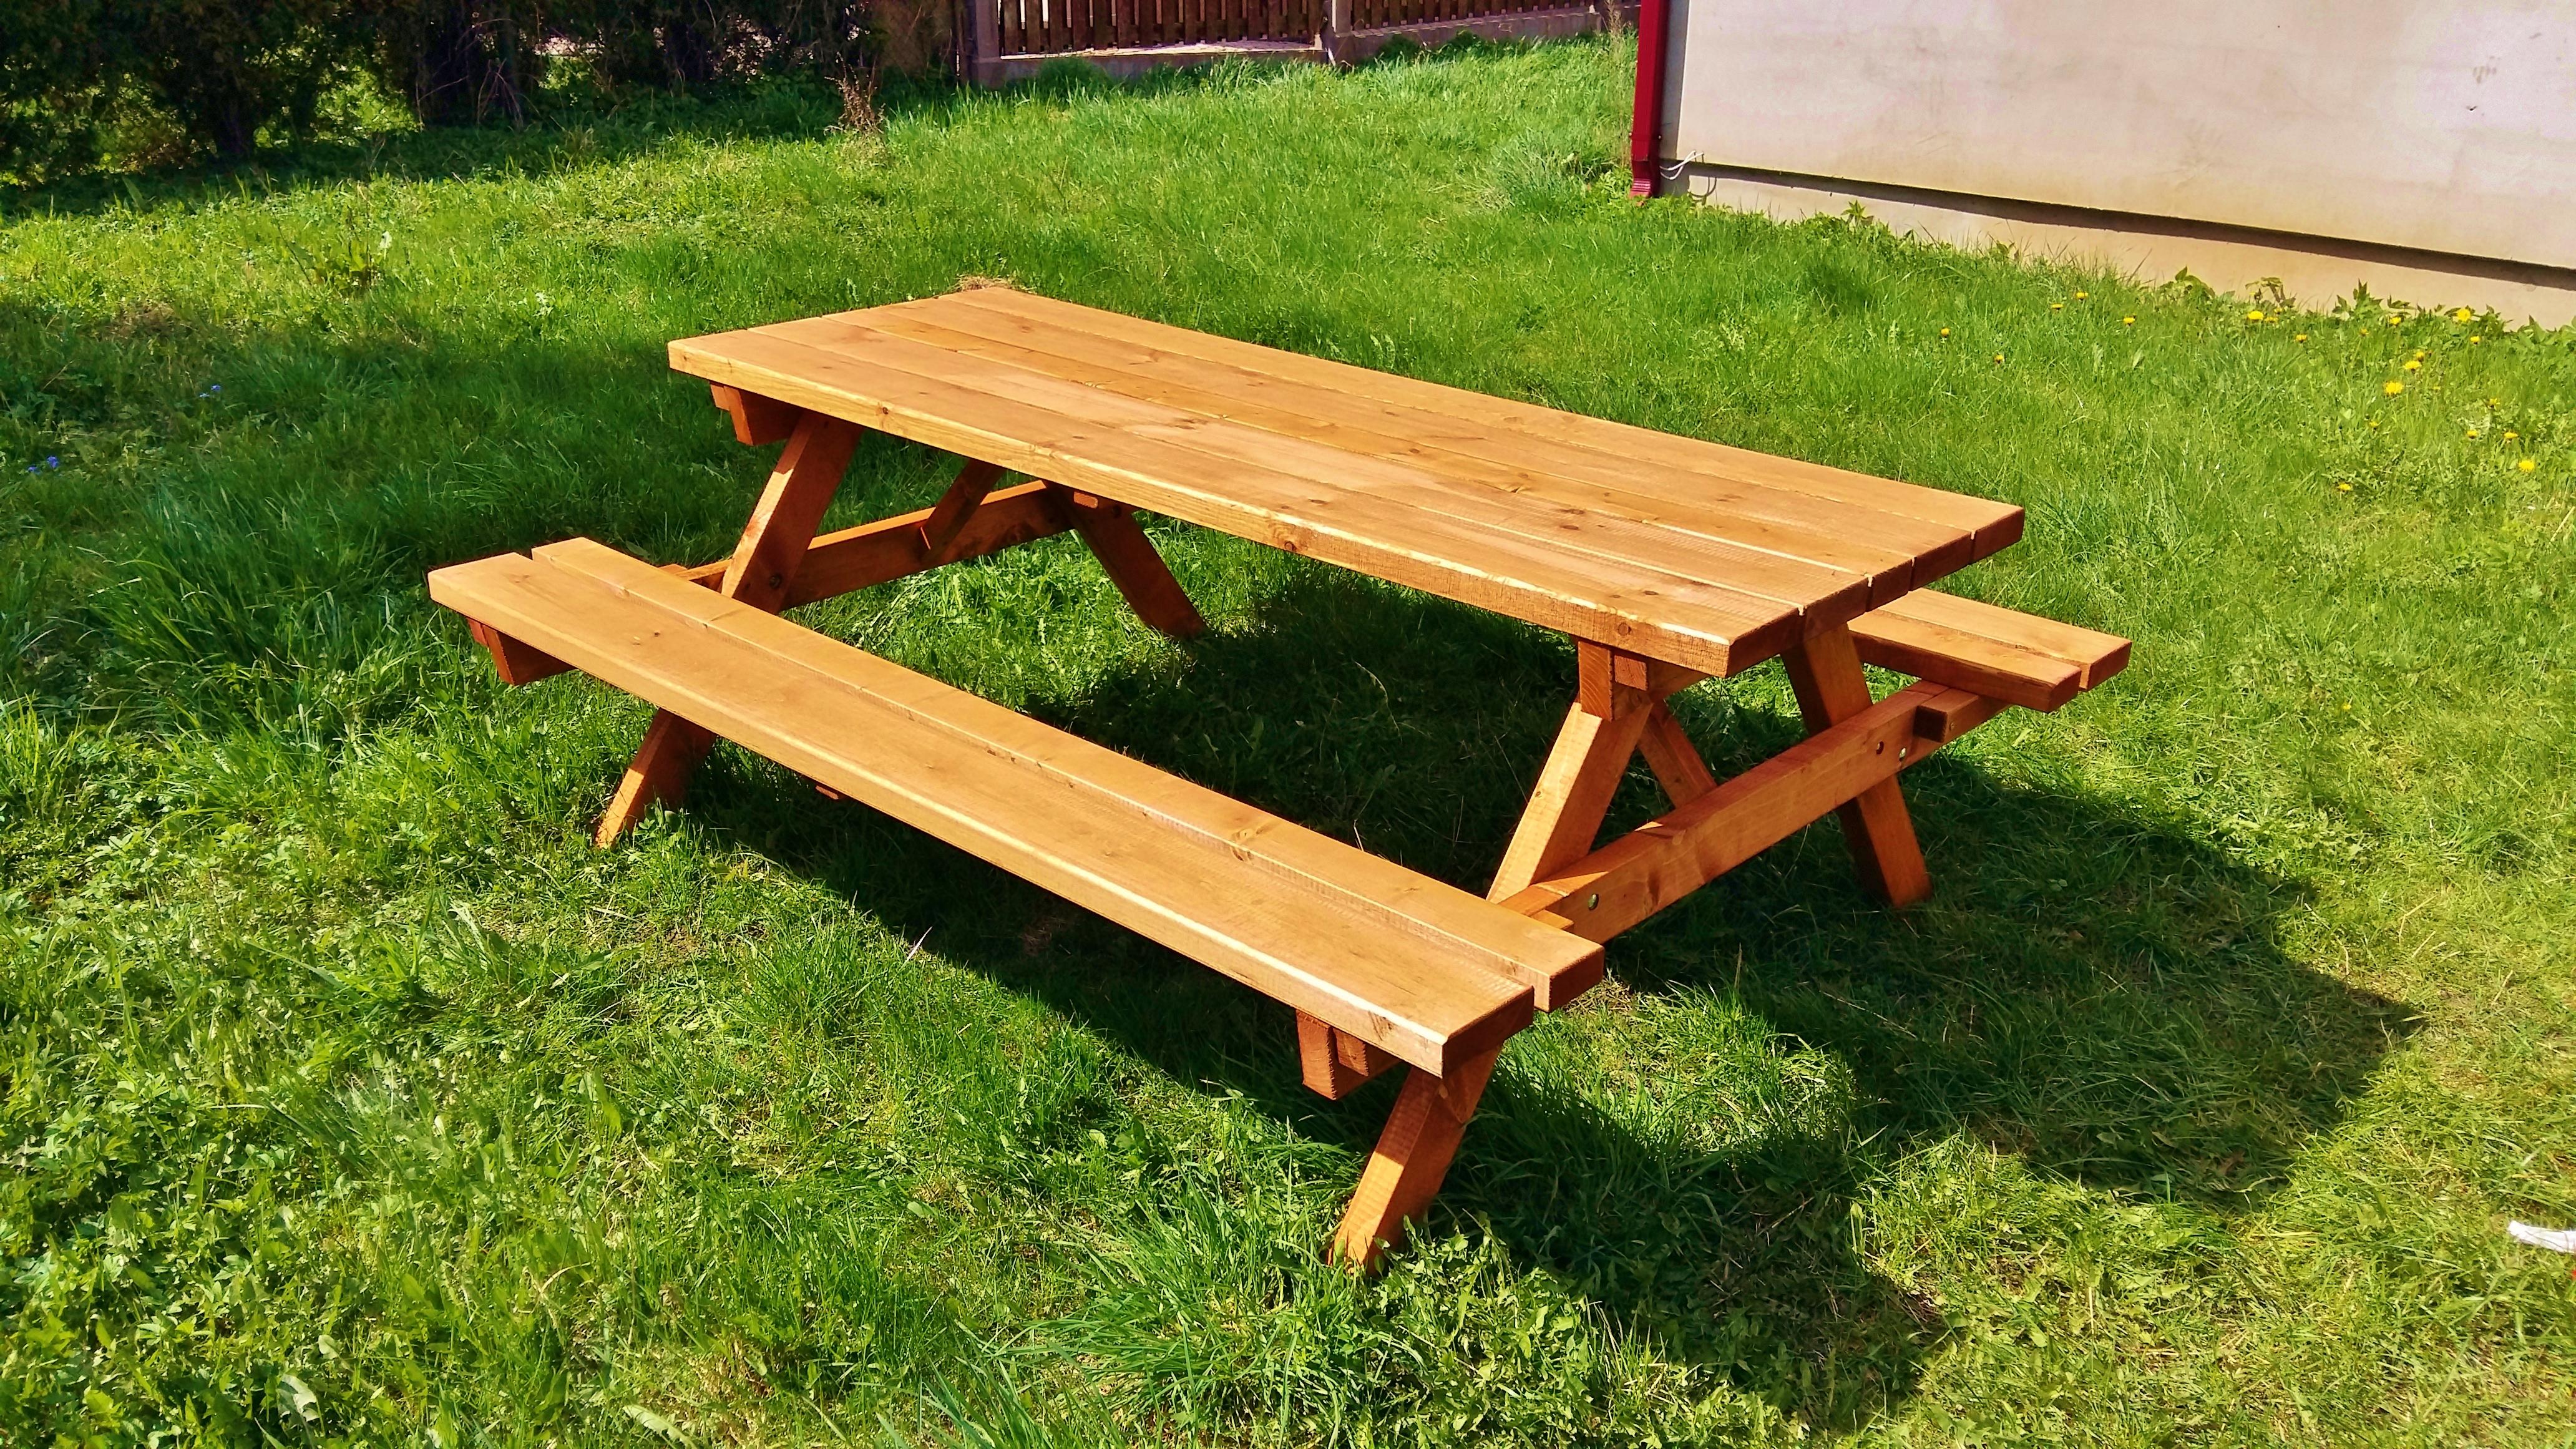 Koka piknika galds